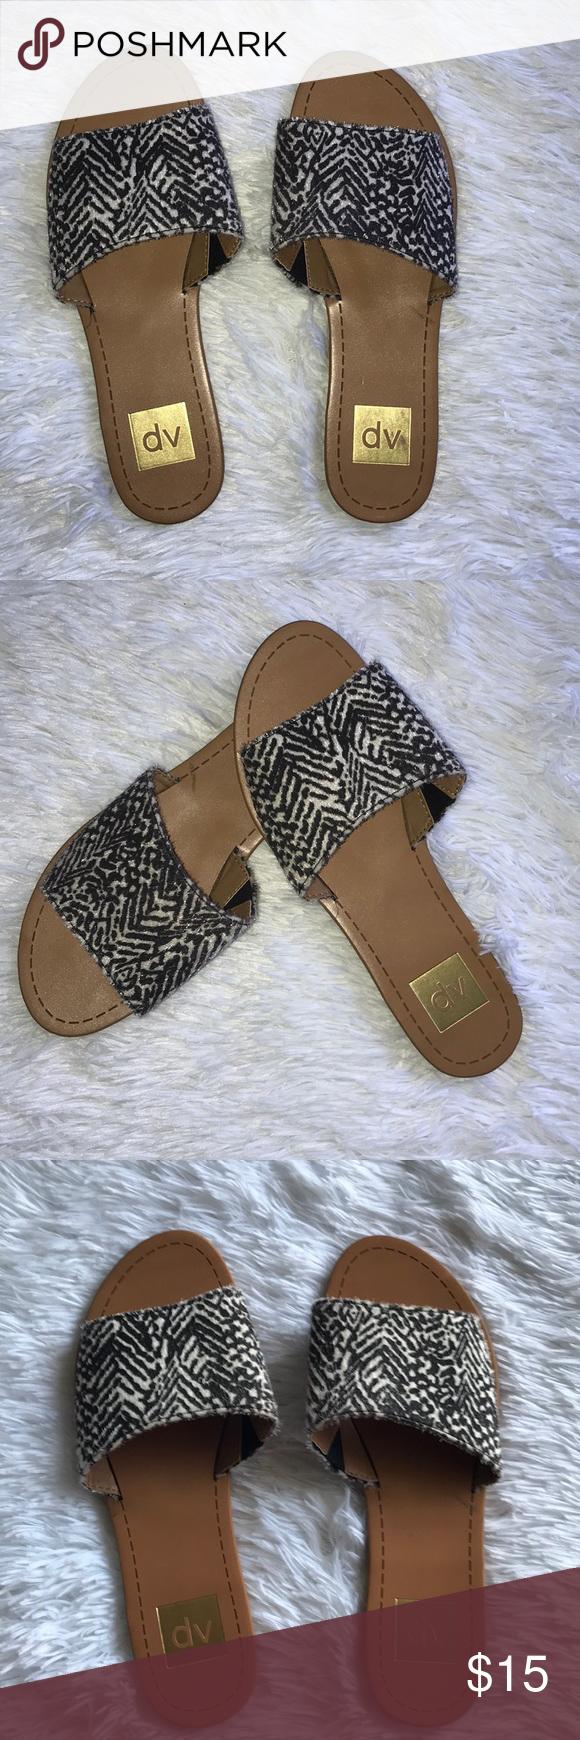 c6ace8f95318 DV Animal Print Slides NWOT SZ 8 Dolce Vita by Target DV by Dolce Vita Shoes